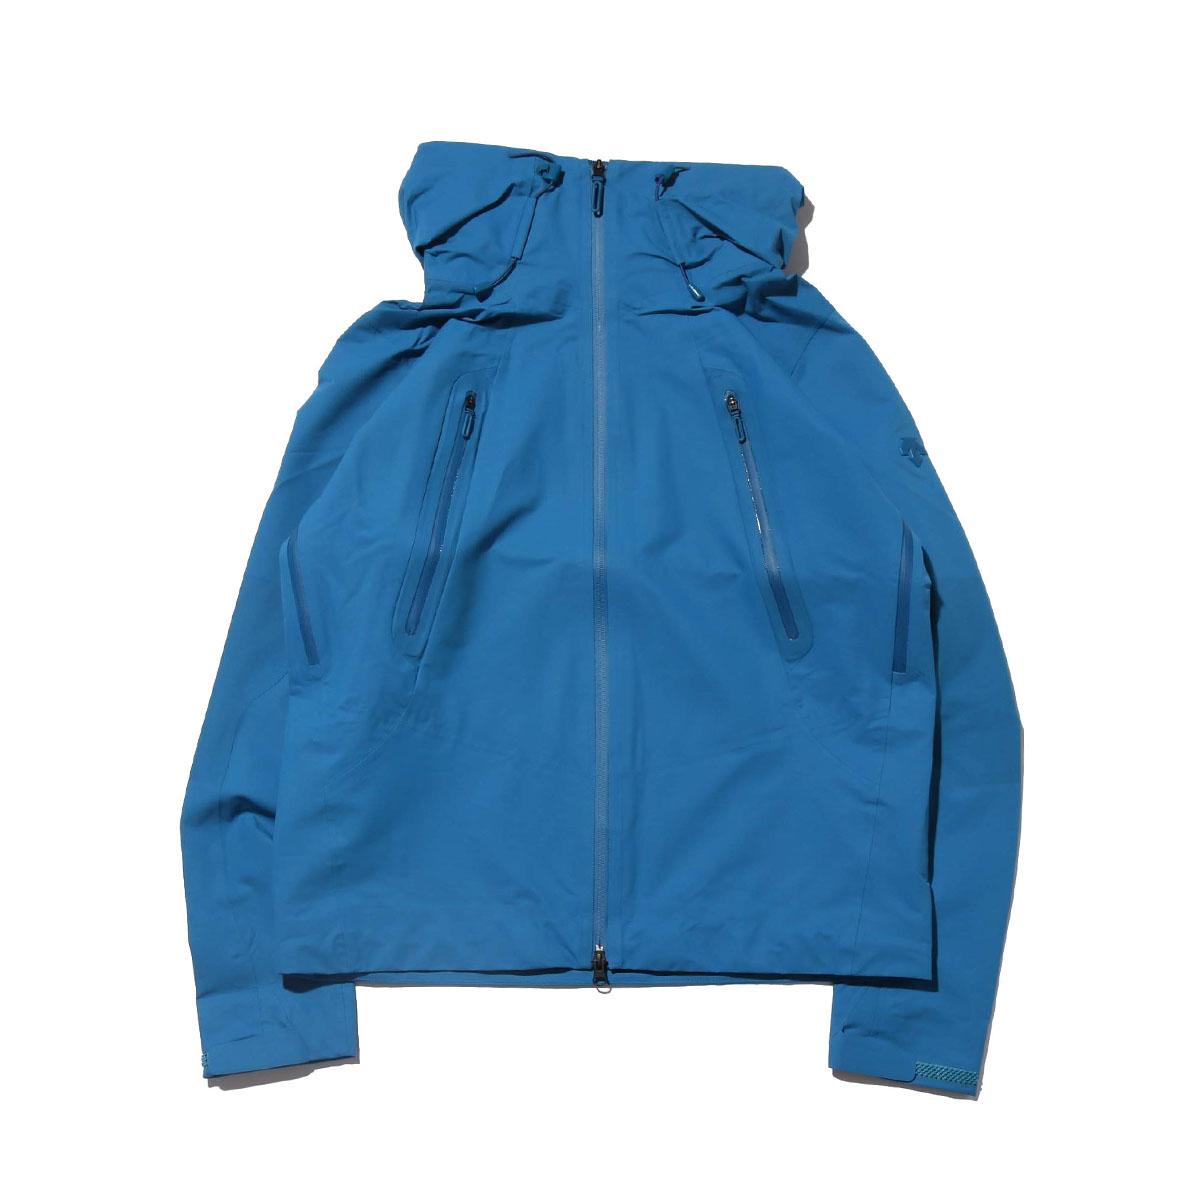 DESCENTE ALLTERRAIN ACTIVE SHELL JACKET(BLUE ACID)(デサント オルテライン アクティブ シェル ジャケット)【メンズ】【ジャケット】【18FA-I】